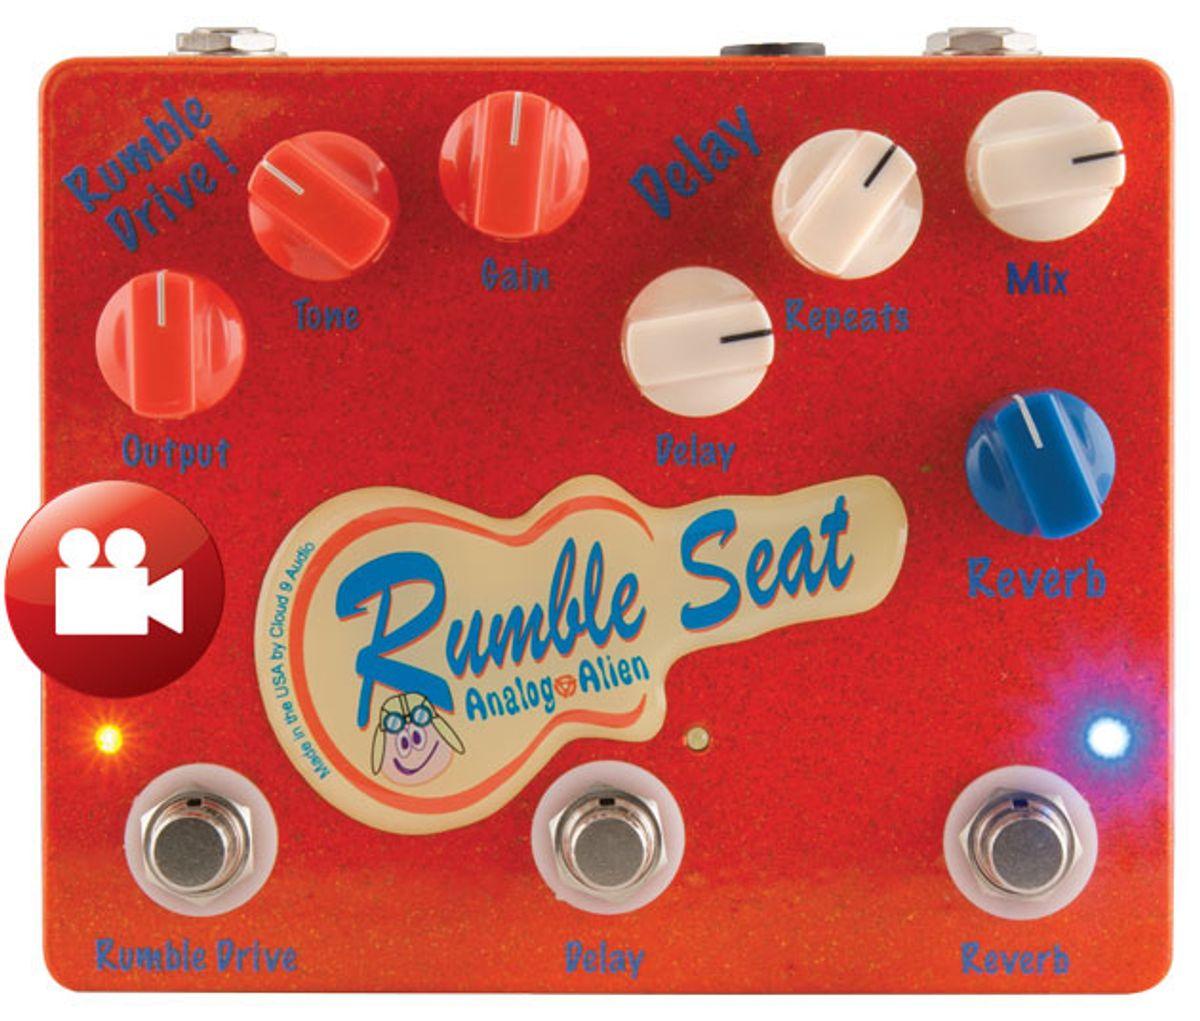 Analog Alien Rumble Seat Review